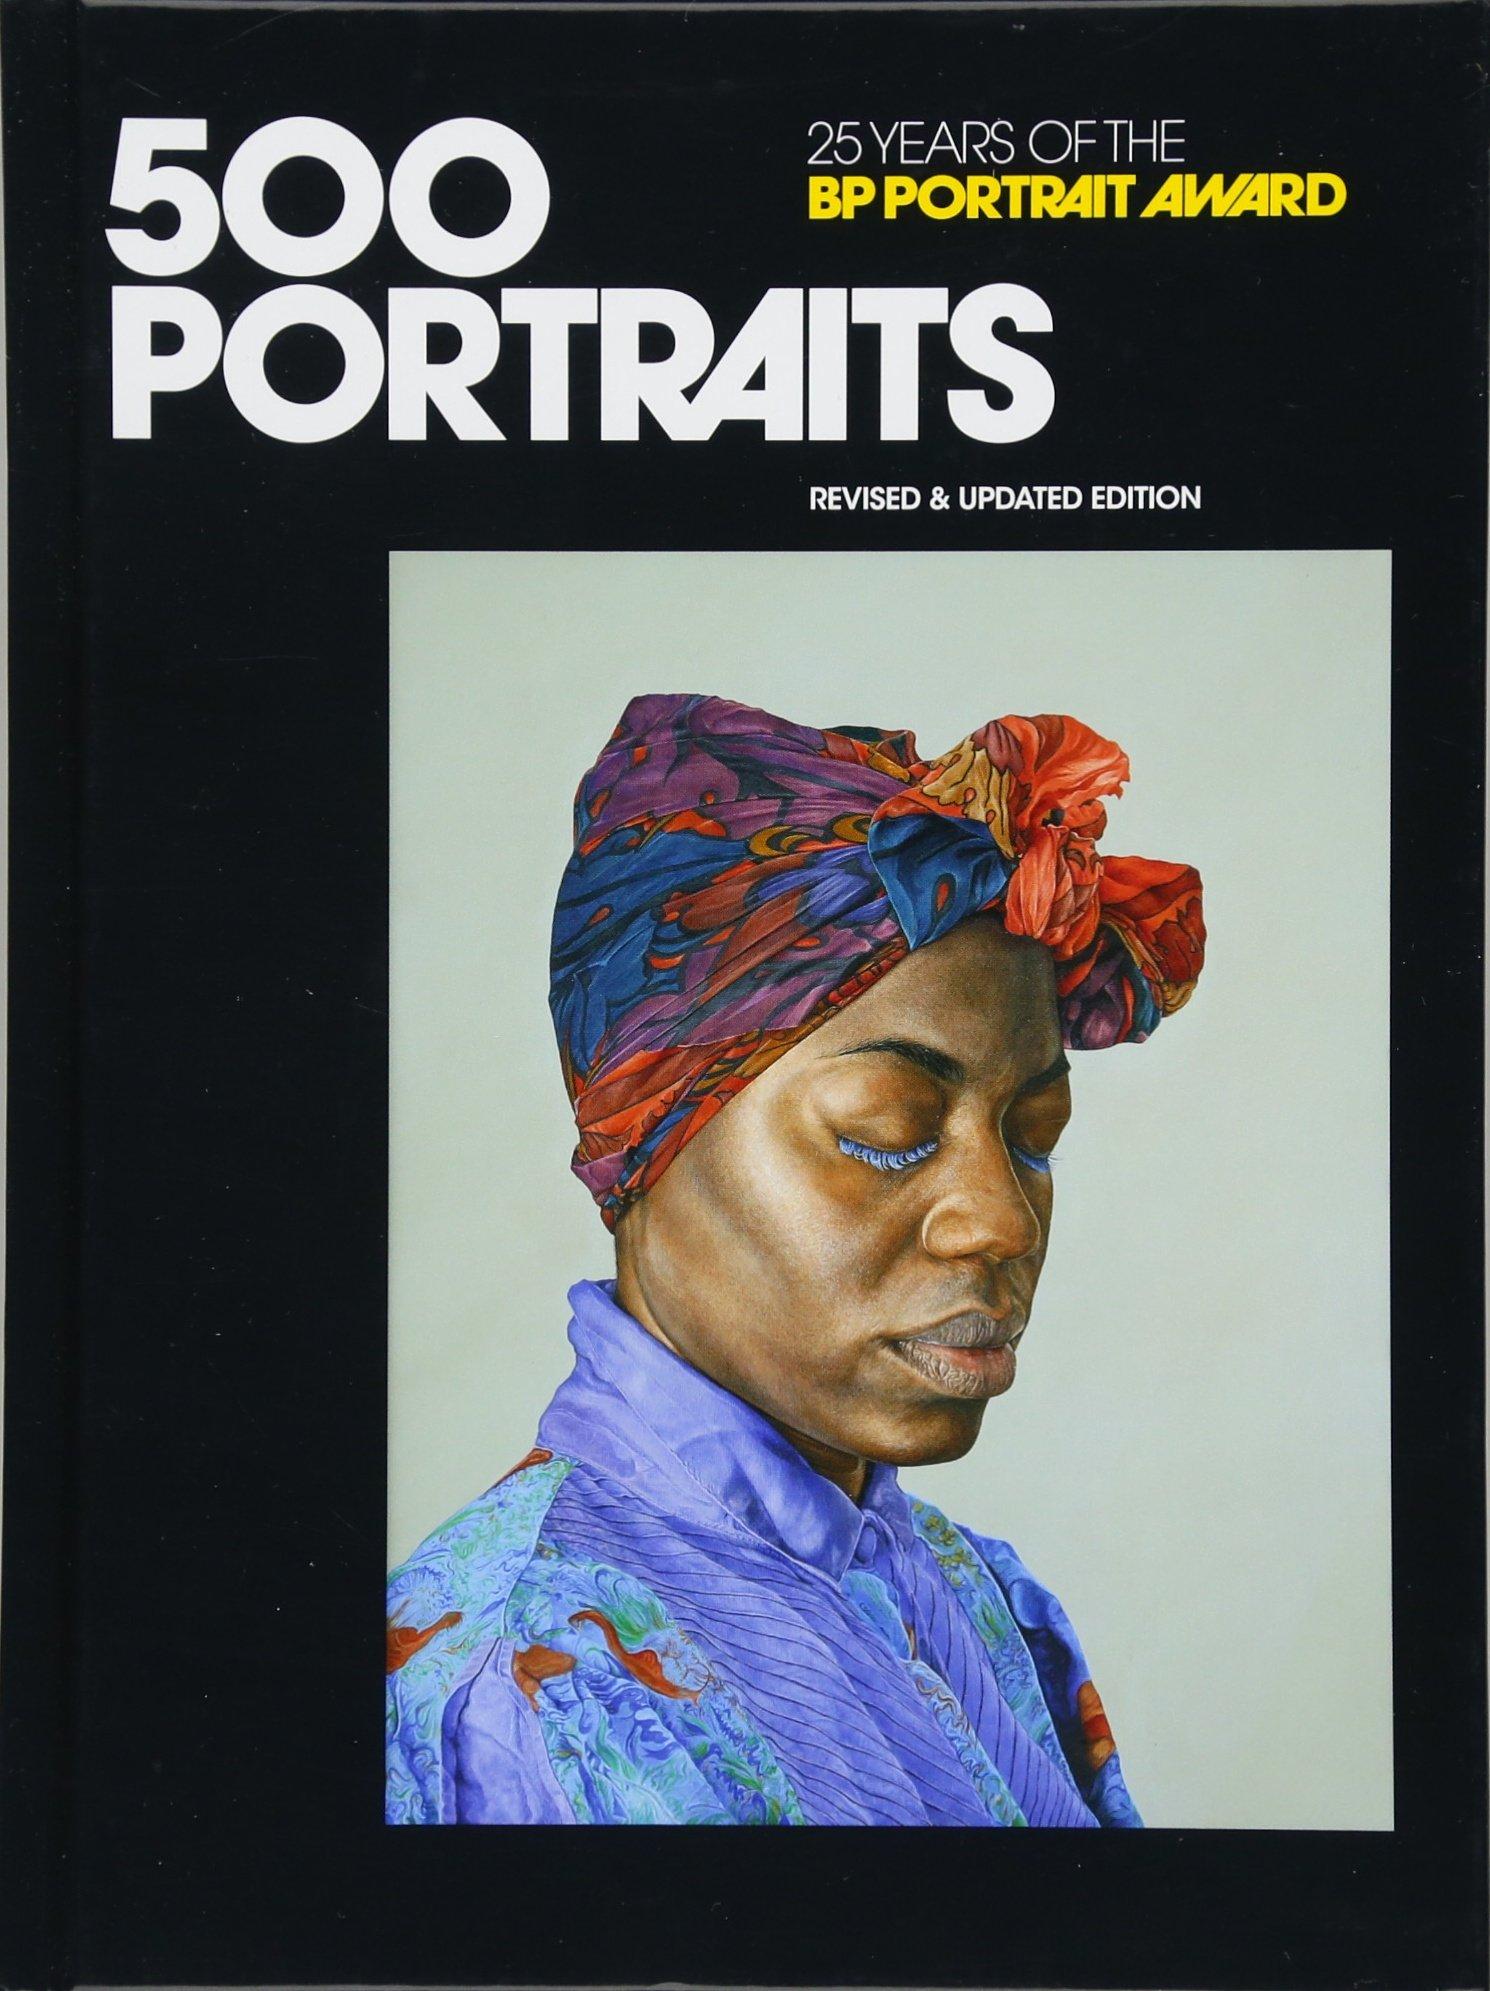 500 Portraits: 25 Years of the BP Portrait Award pdf